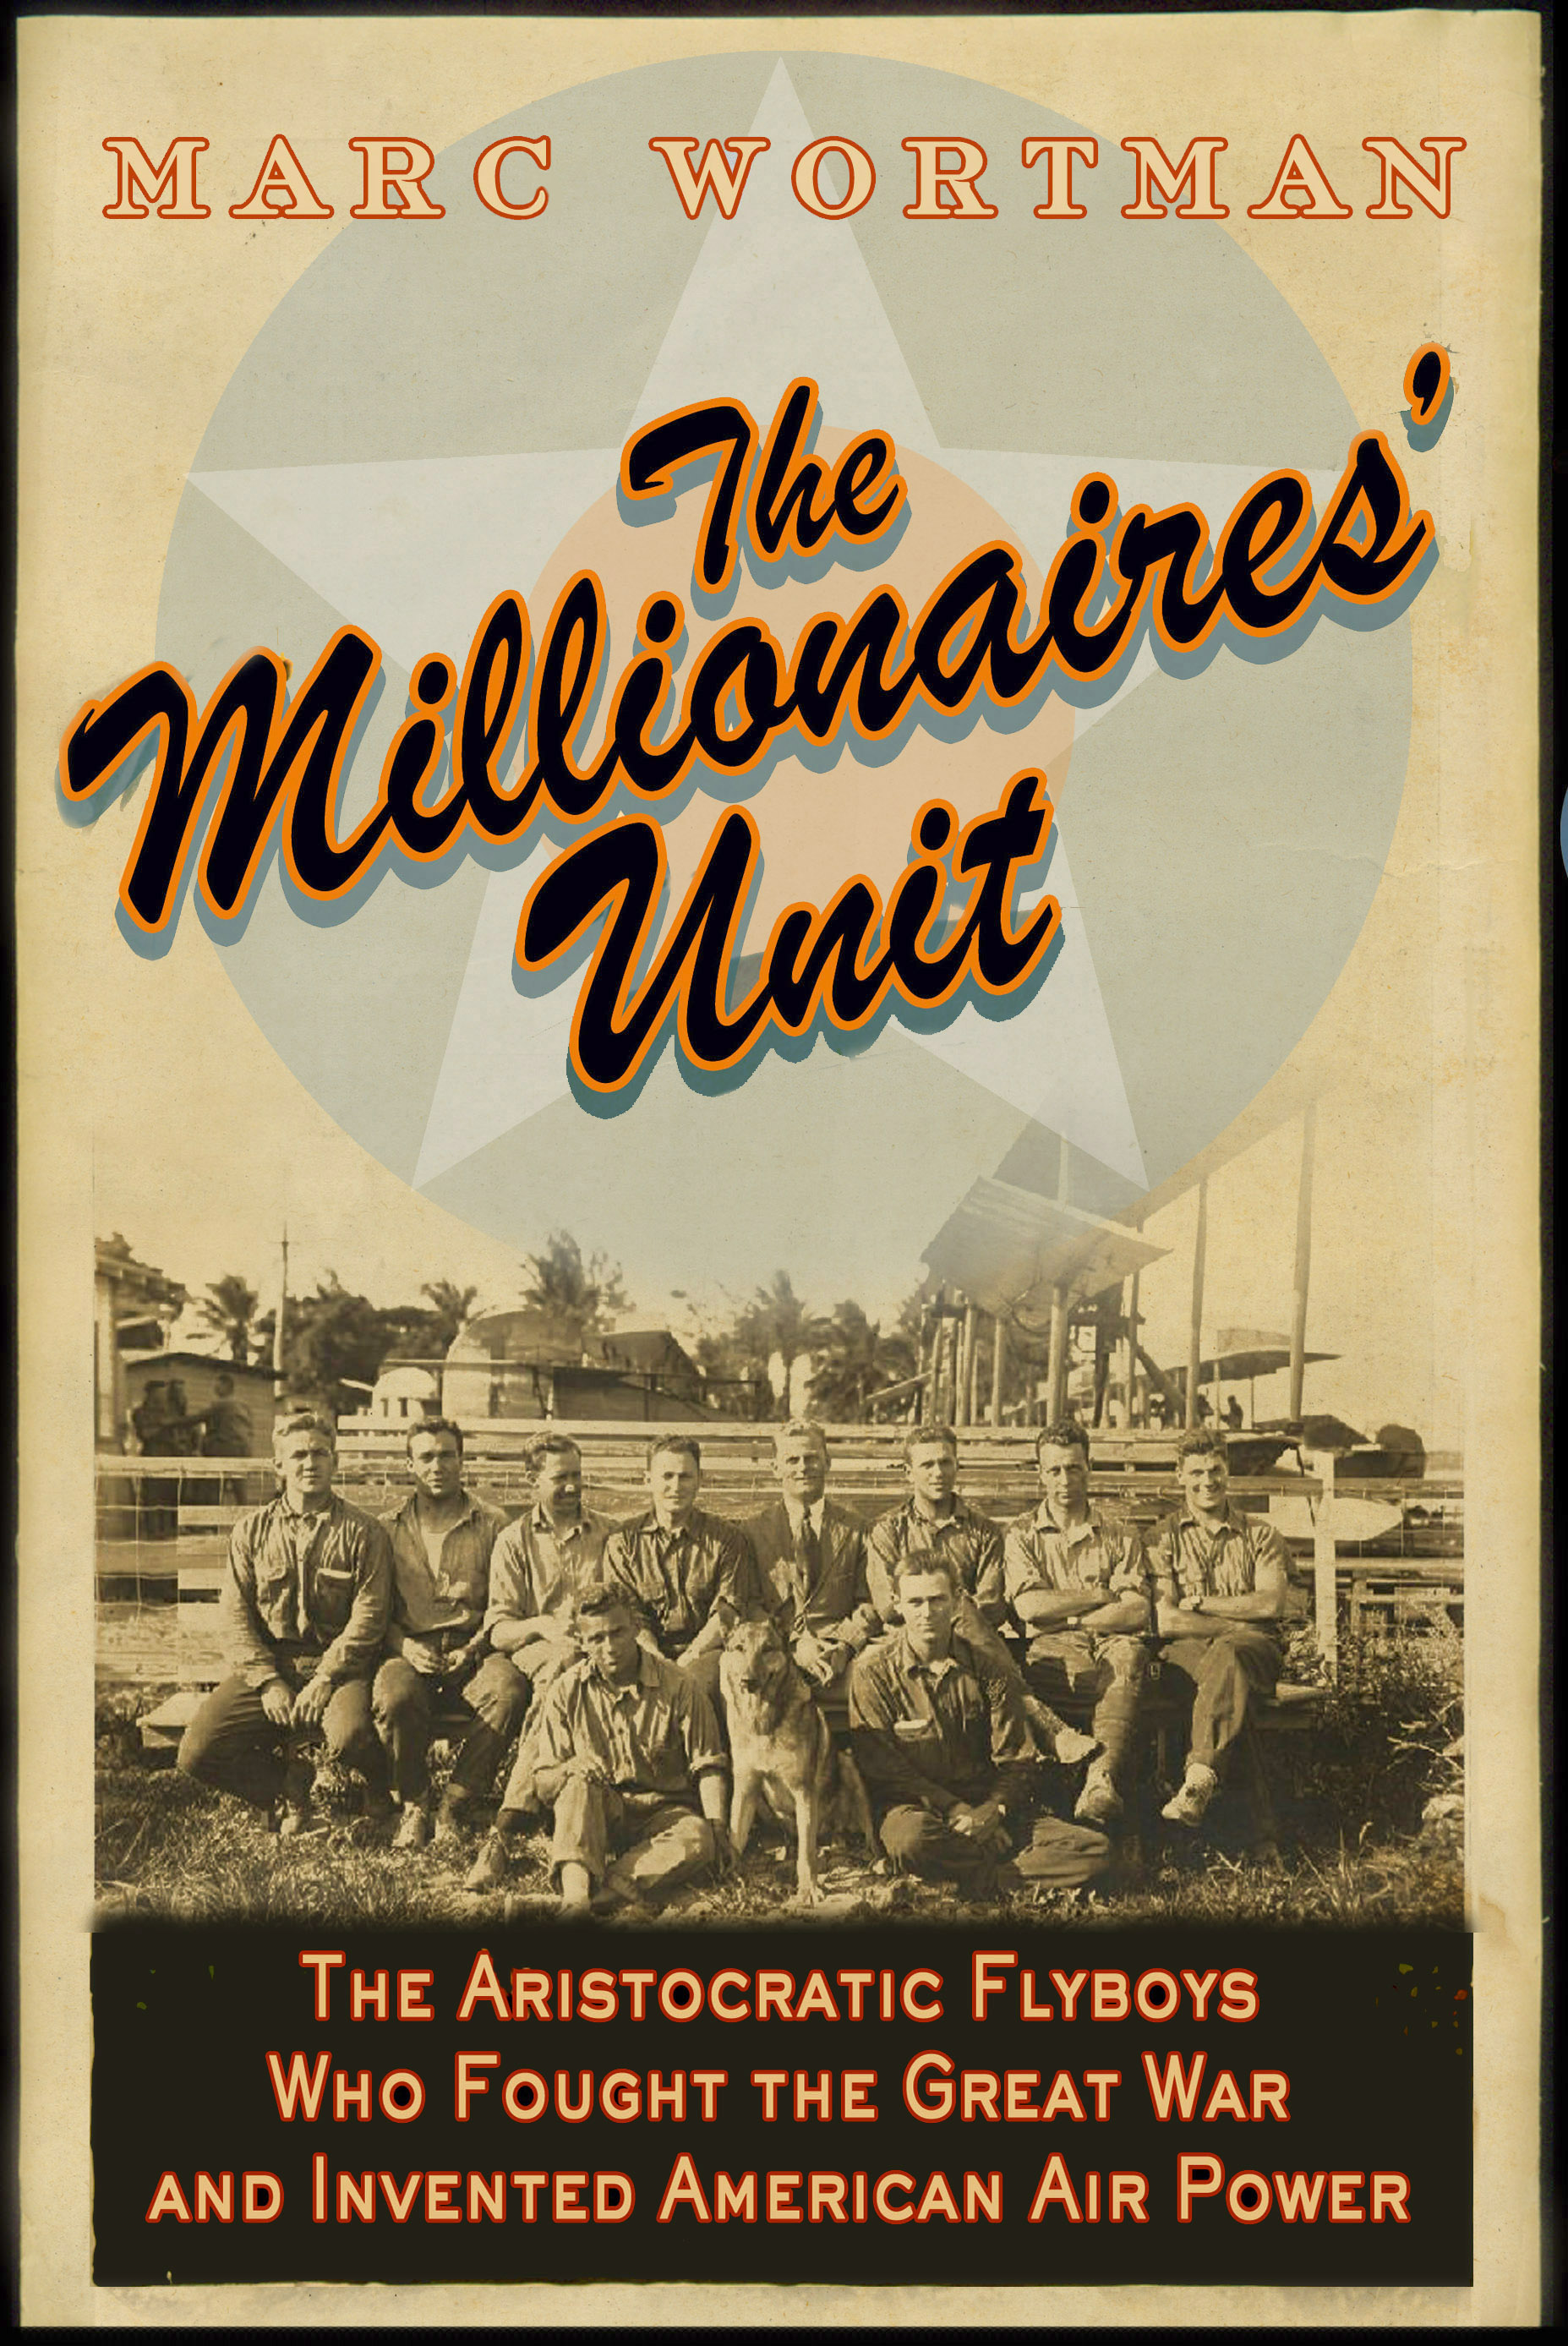 miillionaires-unit